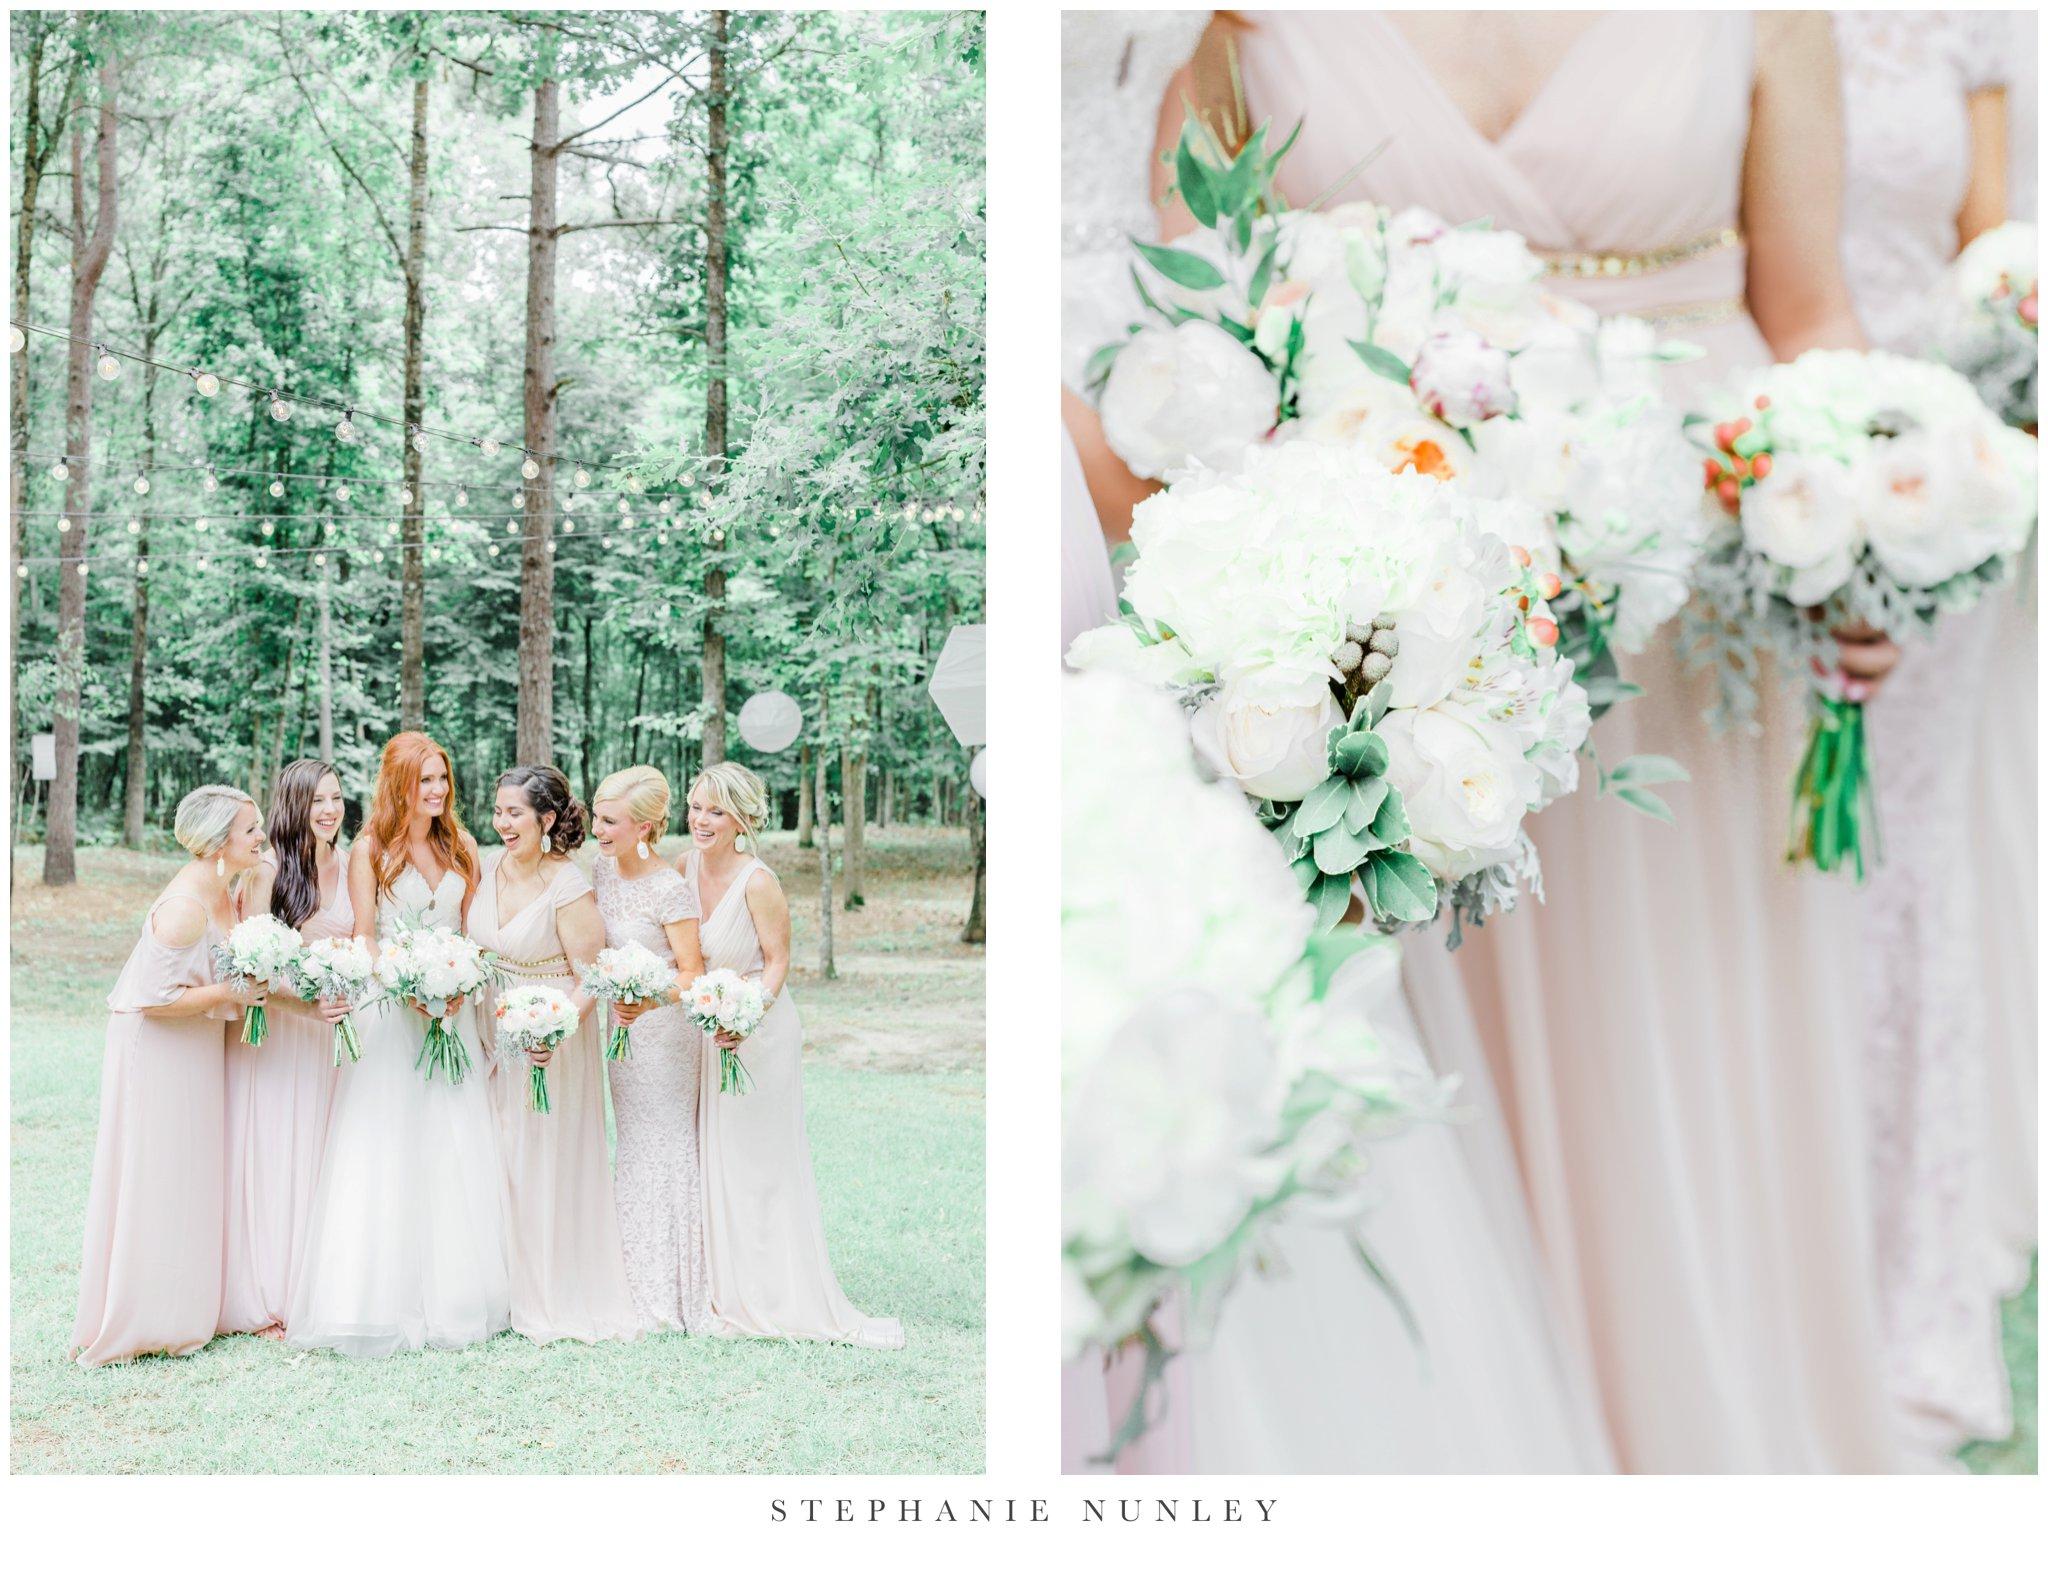 blessing-tree-farm-arkansas-wedding-0055.jpg